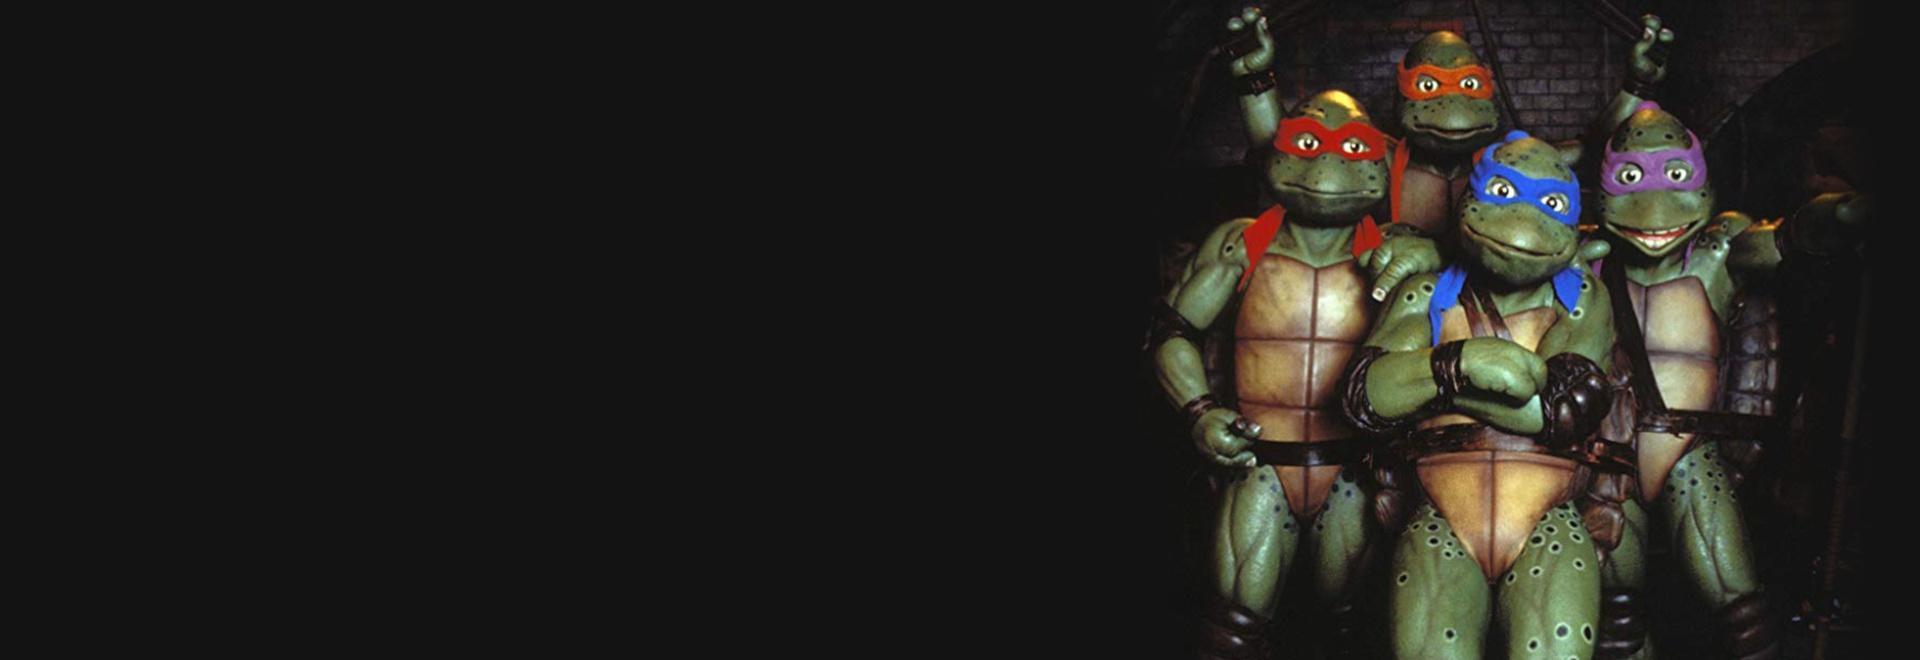 Tartarughe Ninja 3